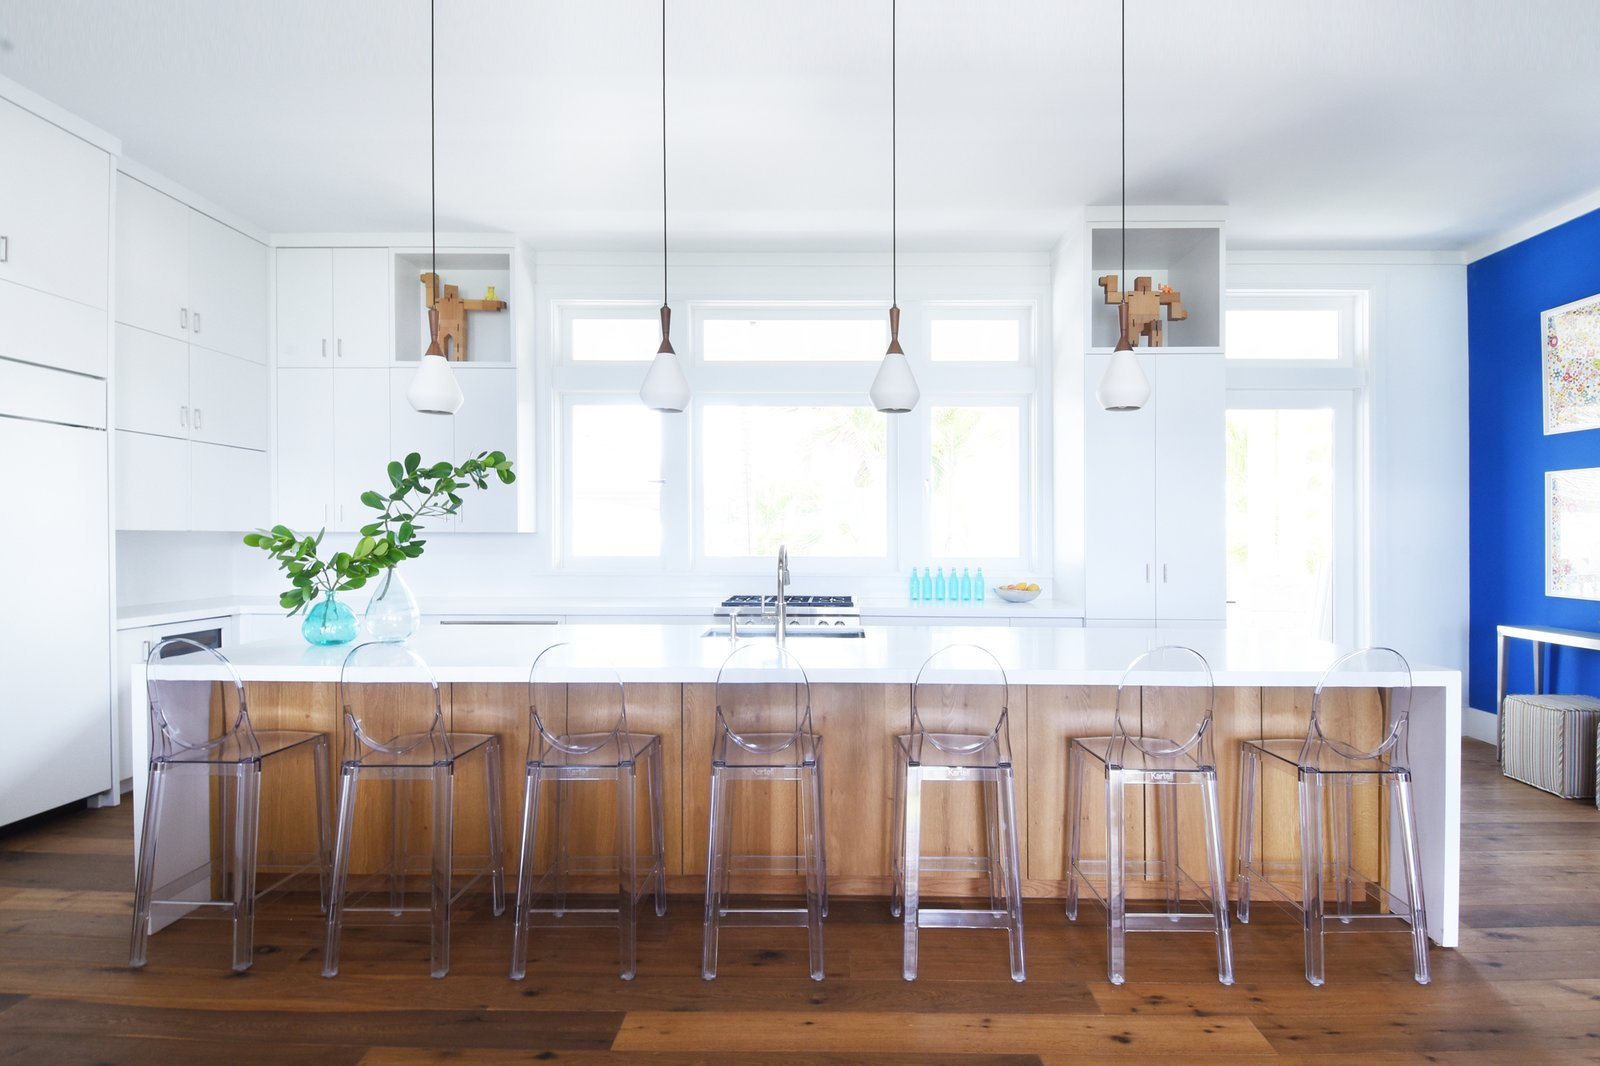 Kitchen, Engineered Quartz Counter, White Cabinet, Medium Hardwood Floor, Subway Tile Backsplashe, Refrigerator, Pendant Lighting, Range, Cooktops, Beverage Center, and Undermount Sink Kitchen  Best Photos from Bahamas Style